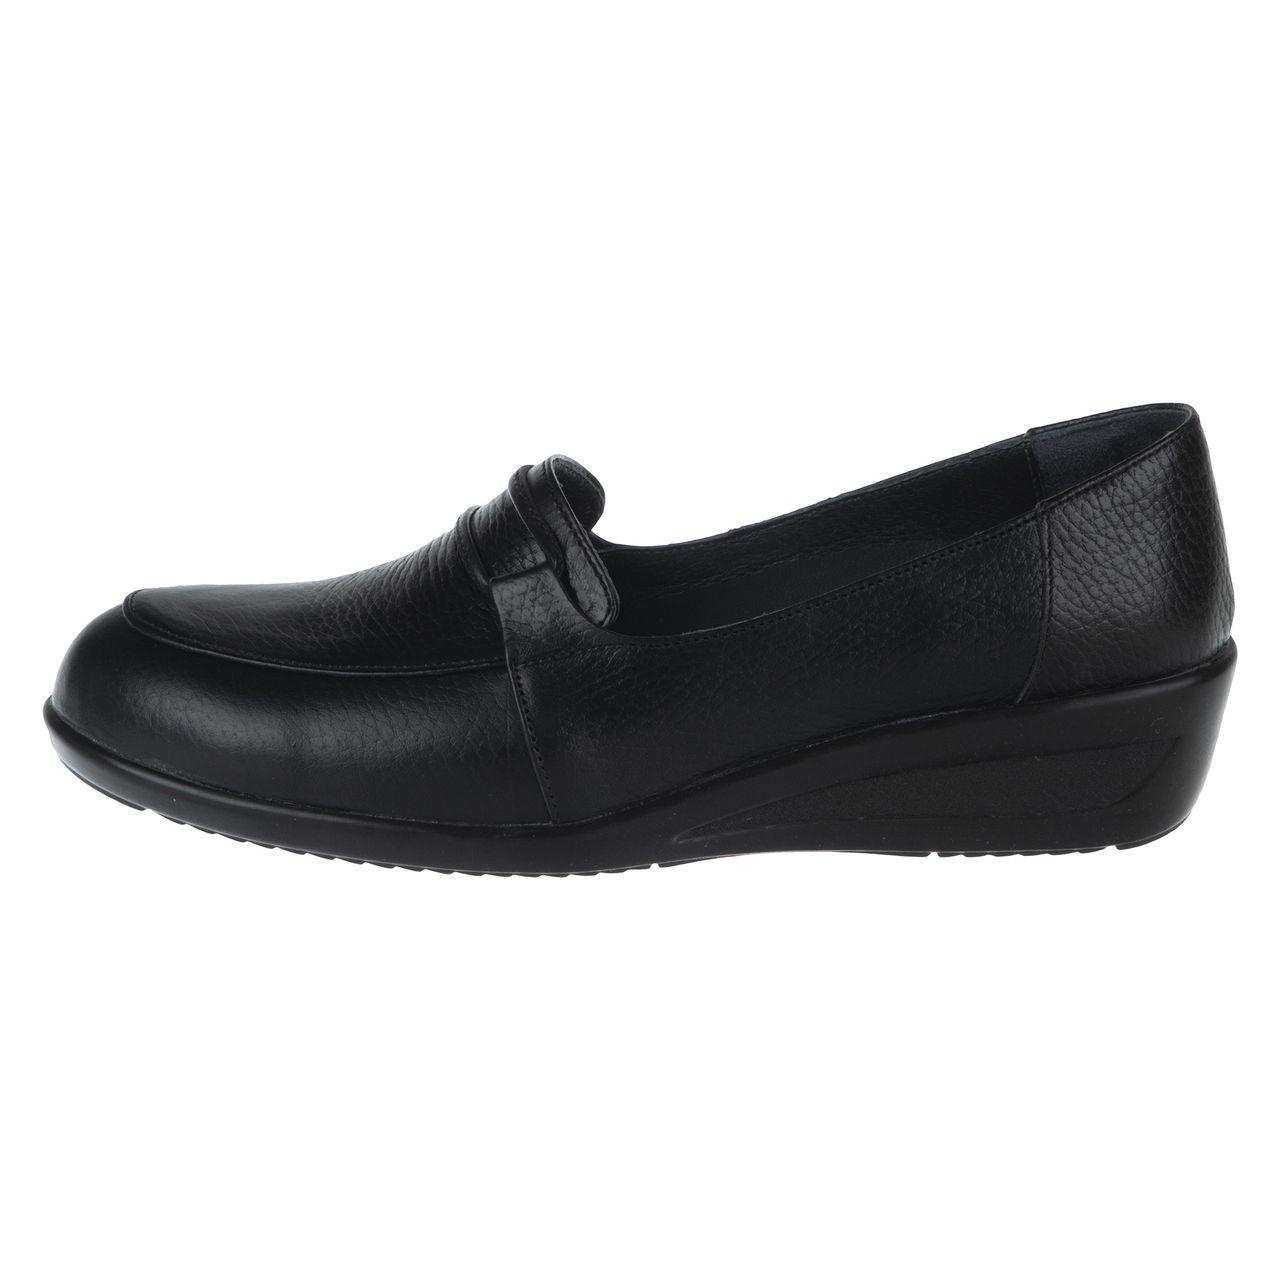 کفش روزمره زنانه شیفر مدل 5279A-101